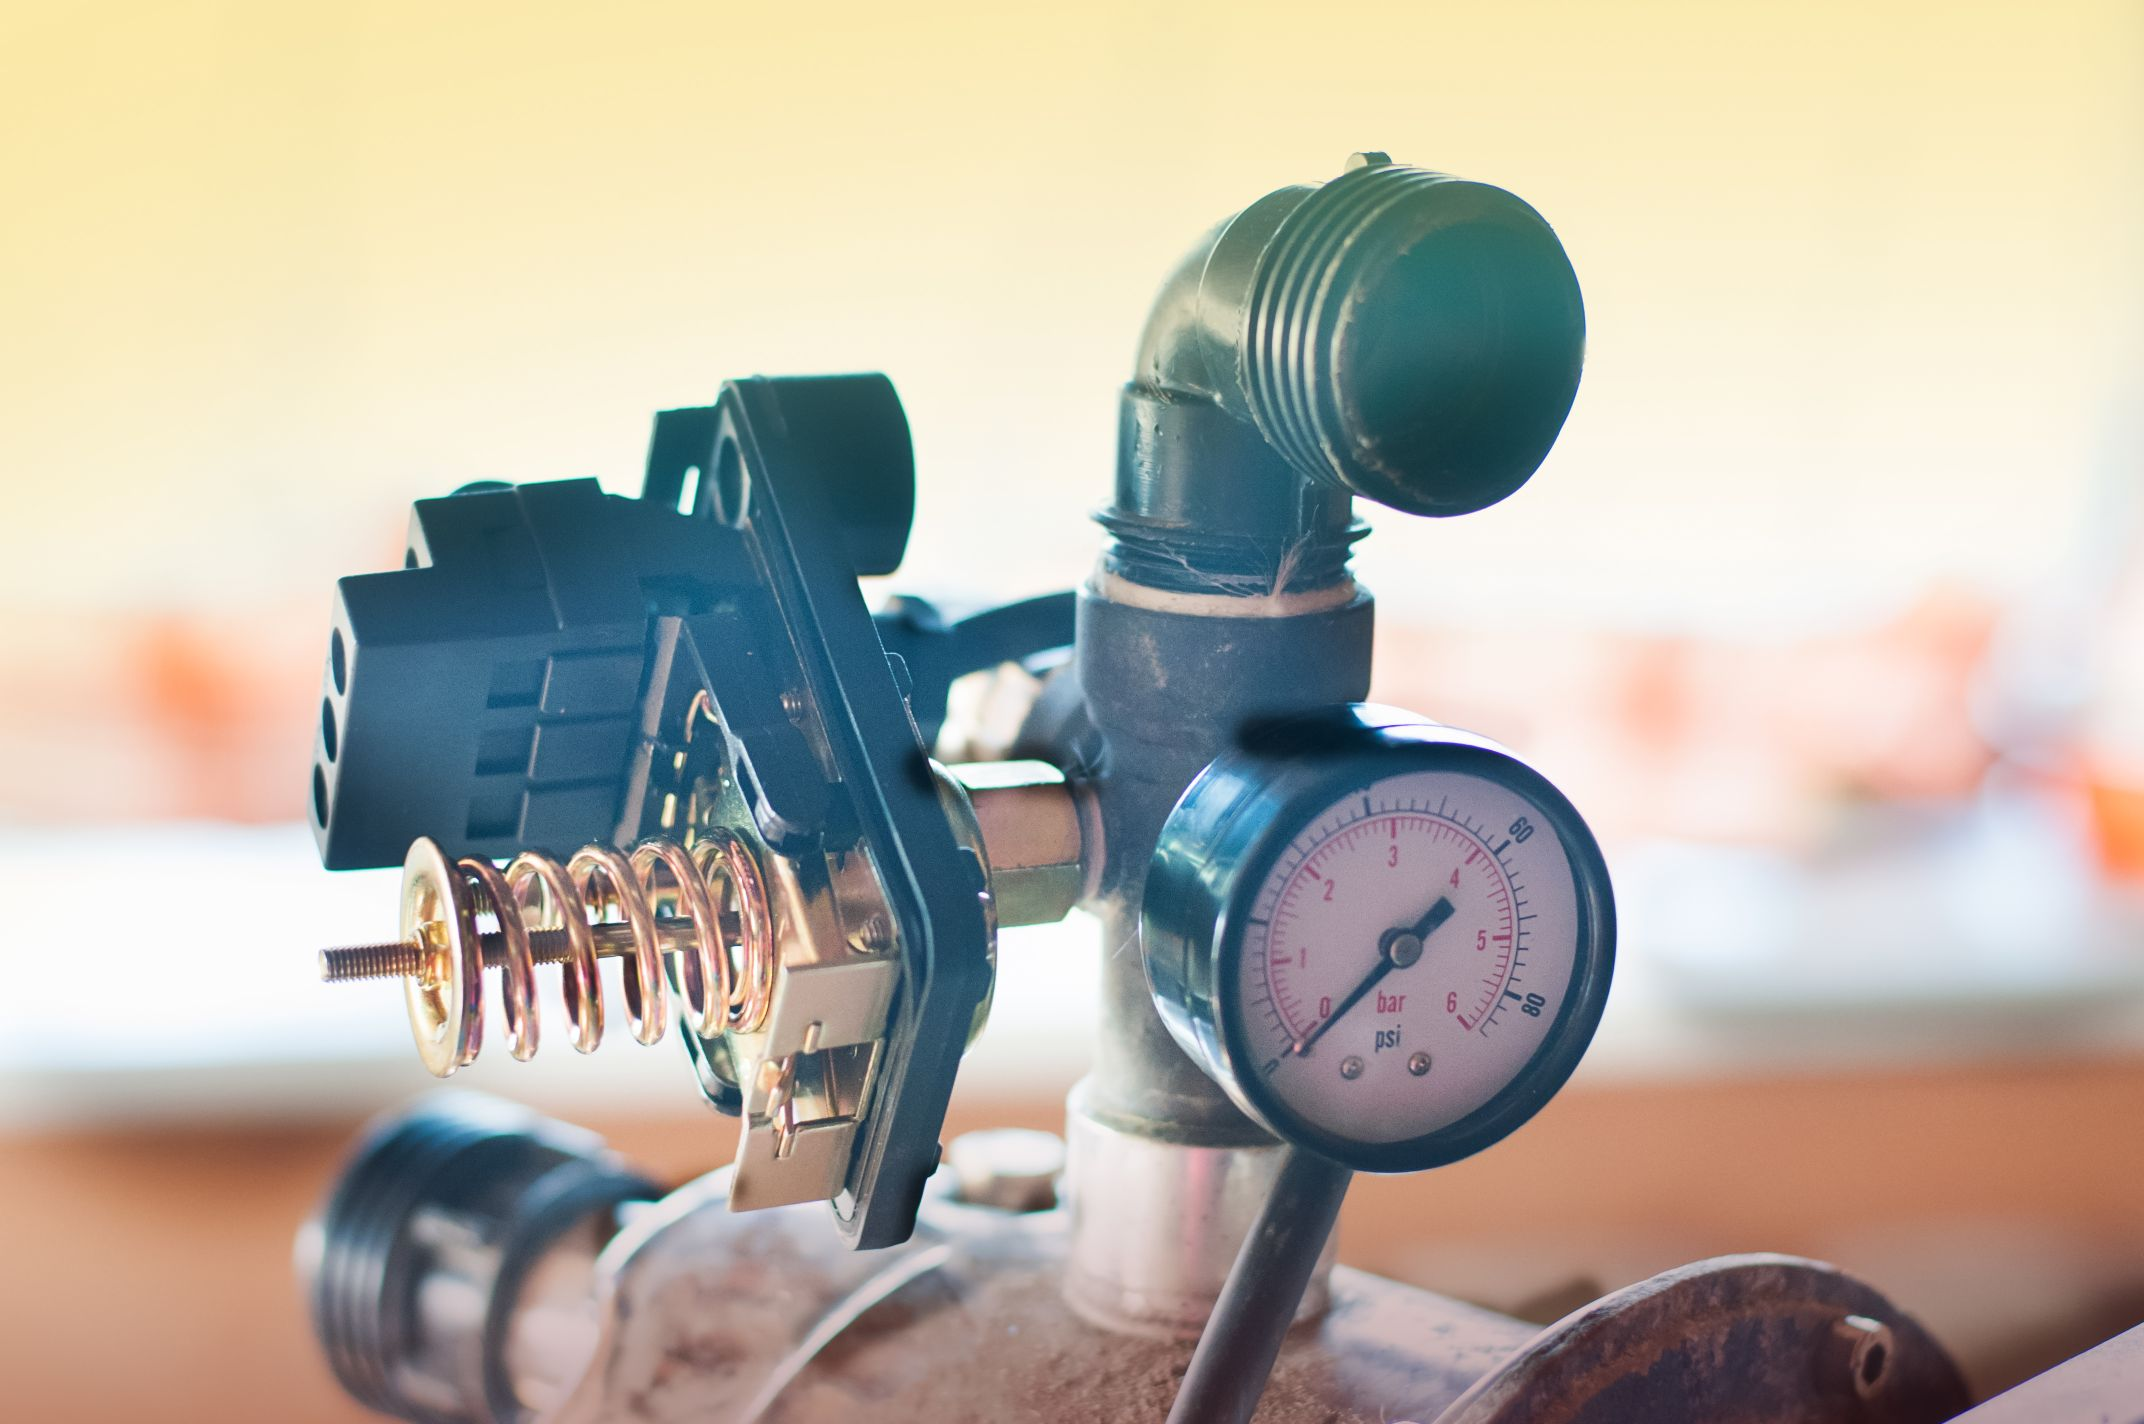 Hydraulic Equipment & Supplies